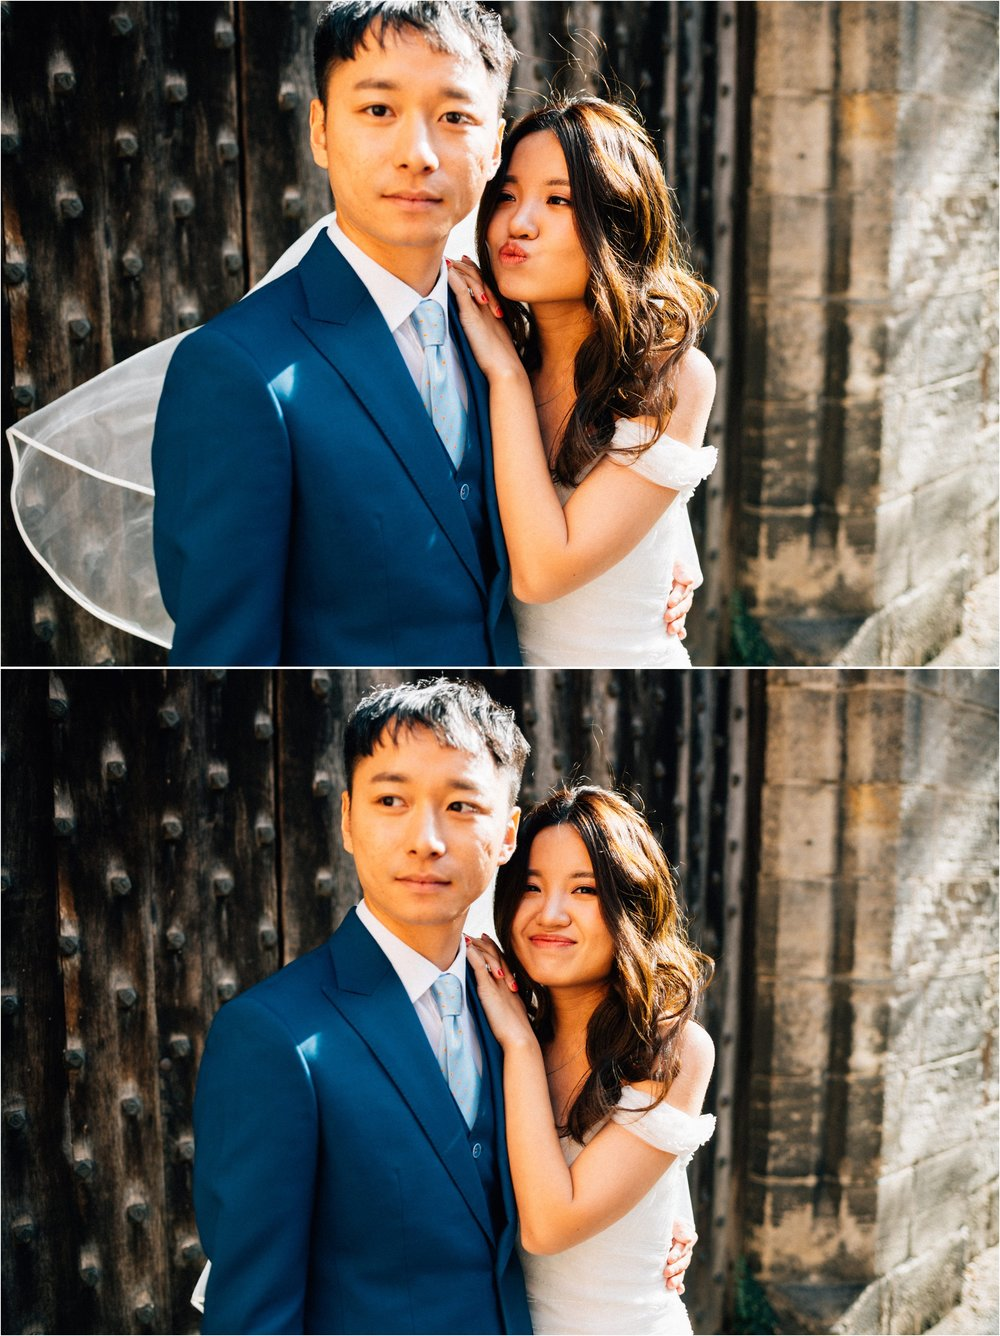 York city elopement wedding photographer_0092.jpg